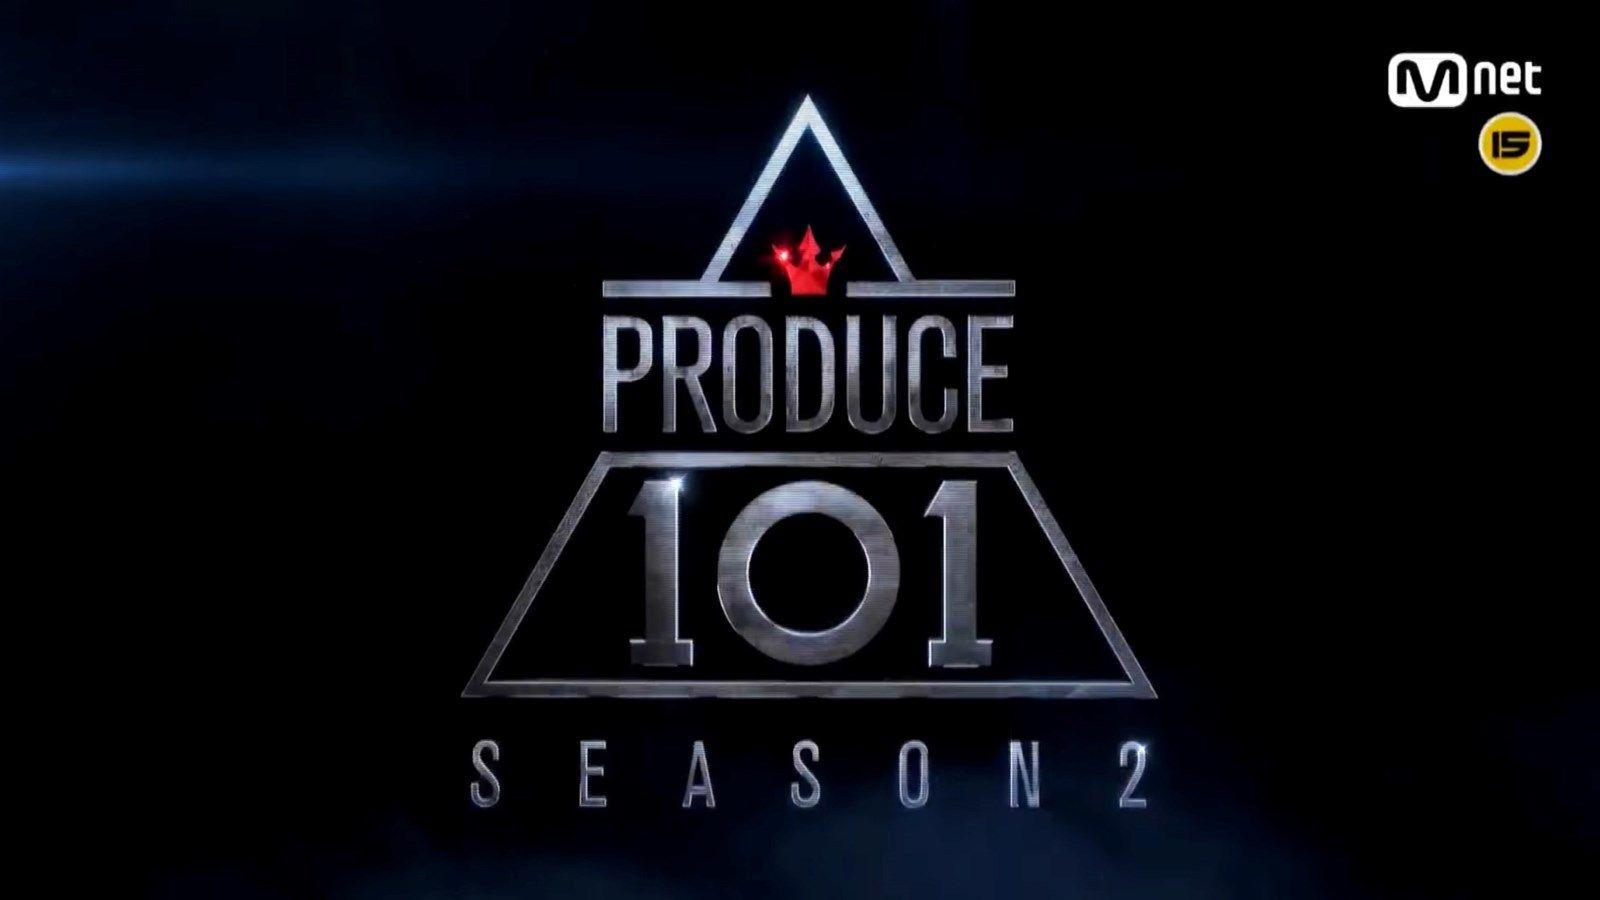 Produce 101 Season 2 Episode 02 | Variety Show | Produce 101